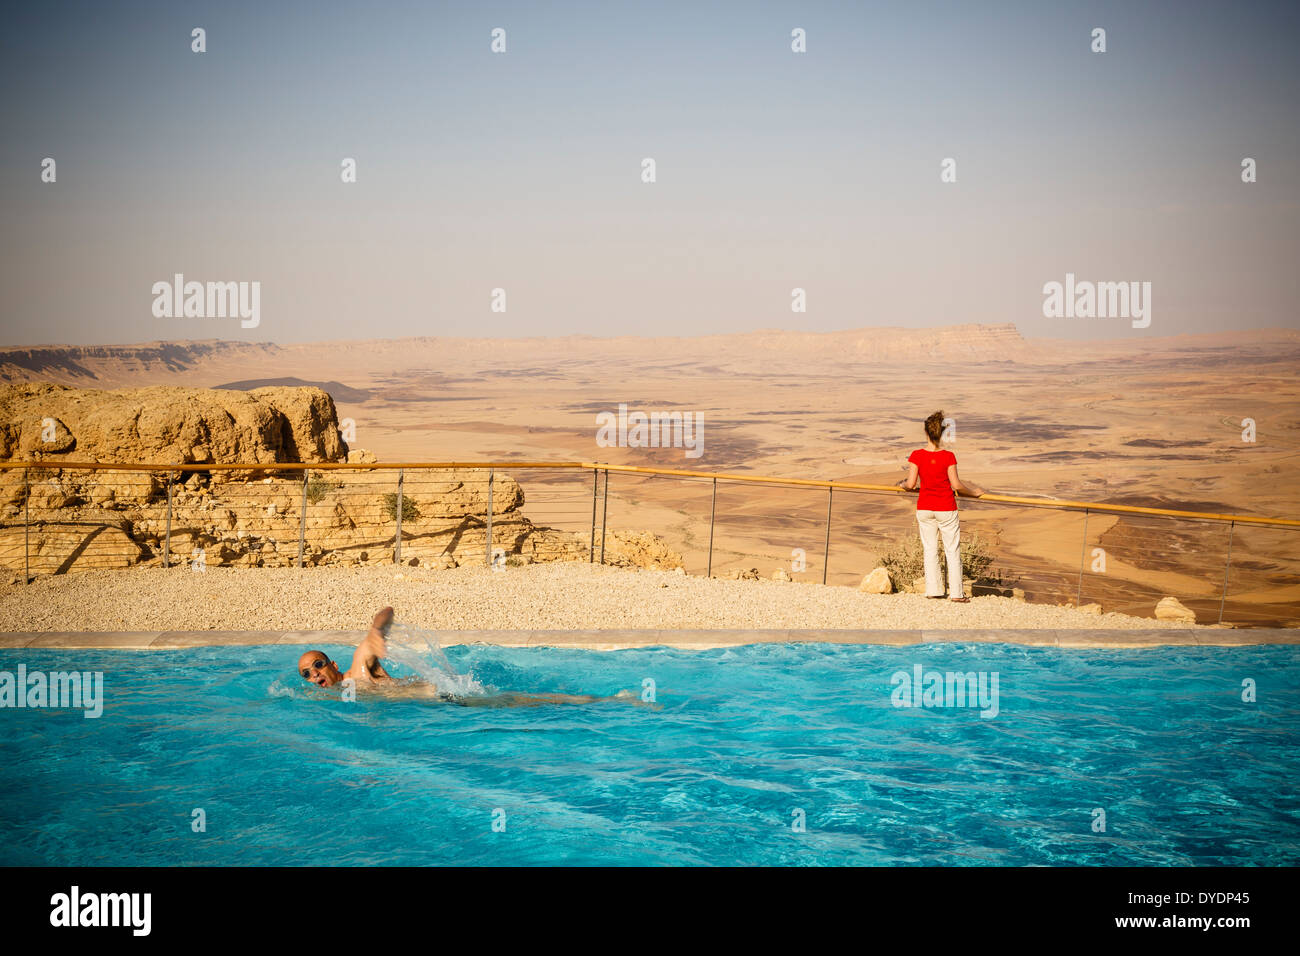 View over the Ramon crater seen from Beresheet hotel, Mitzpe Ramon, Negev region, Israel. - Stock Image